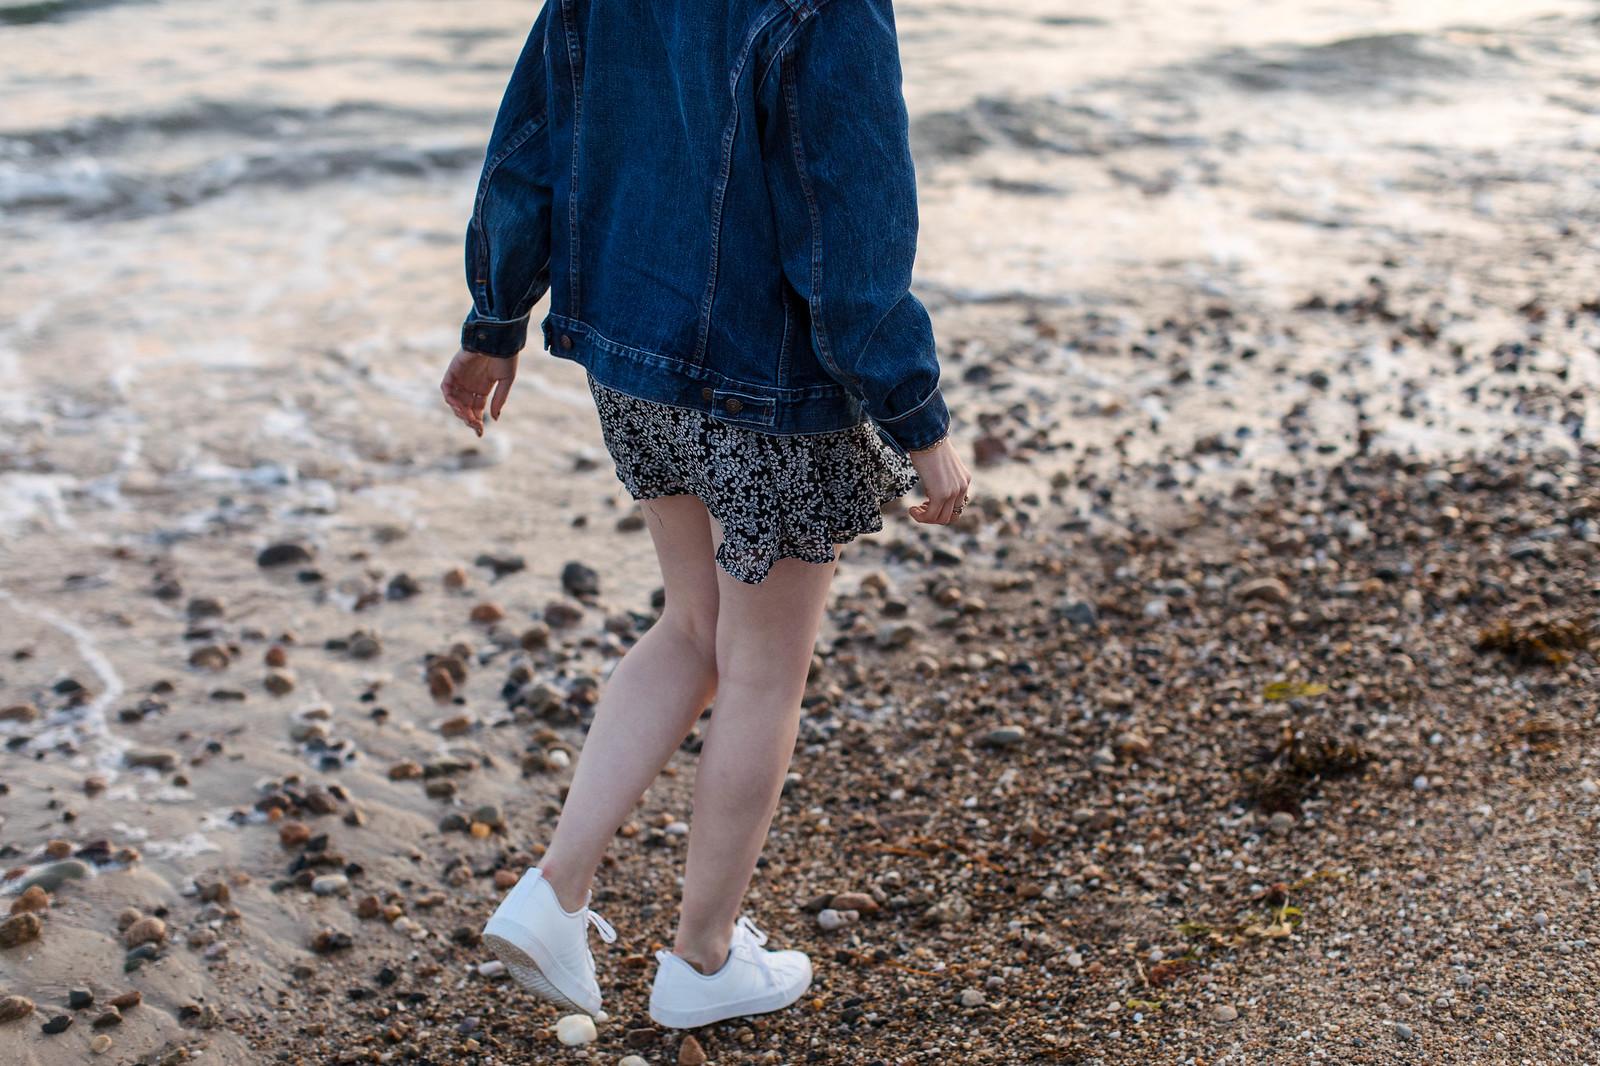 Summer Style Marthas Vineyard Sunset Portrait on juliettelaura.blogspot.com